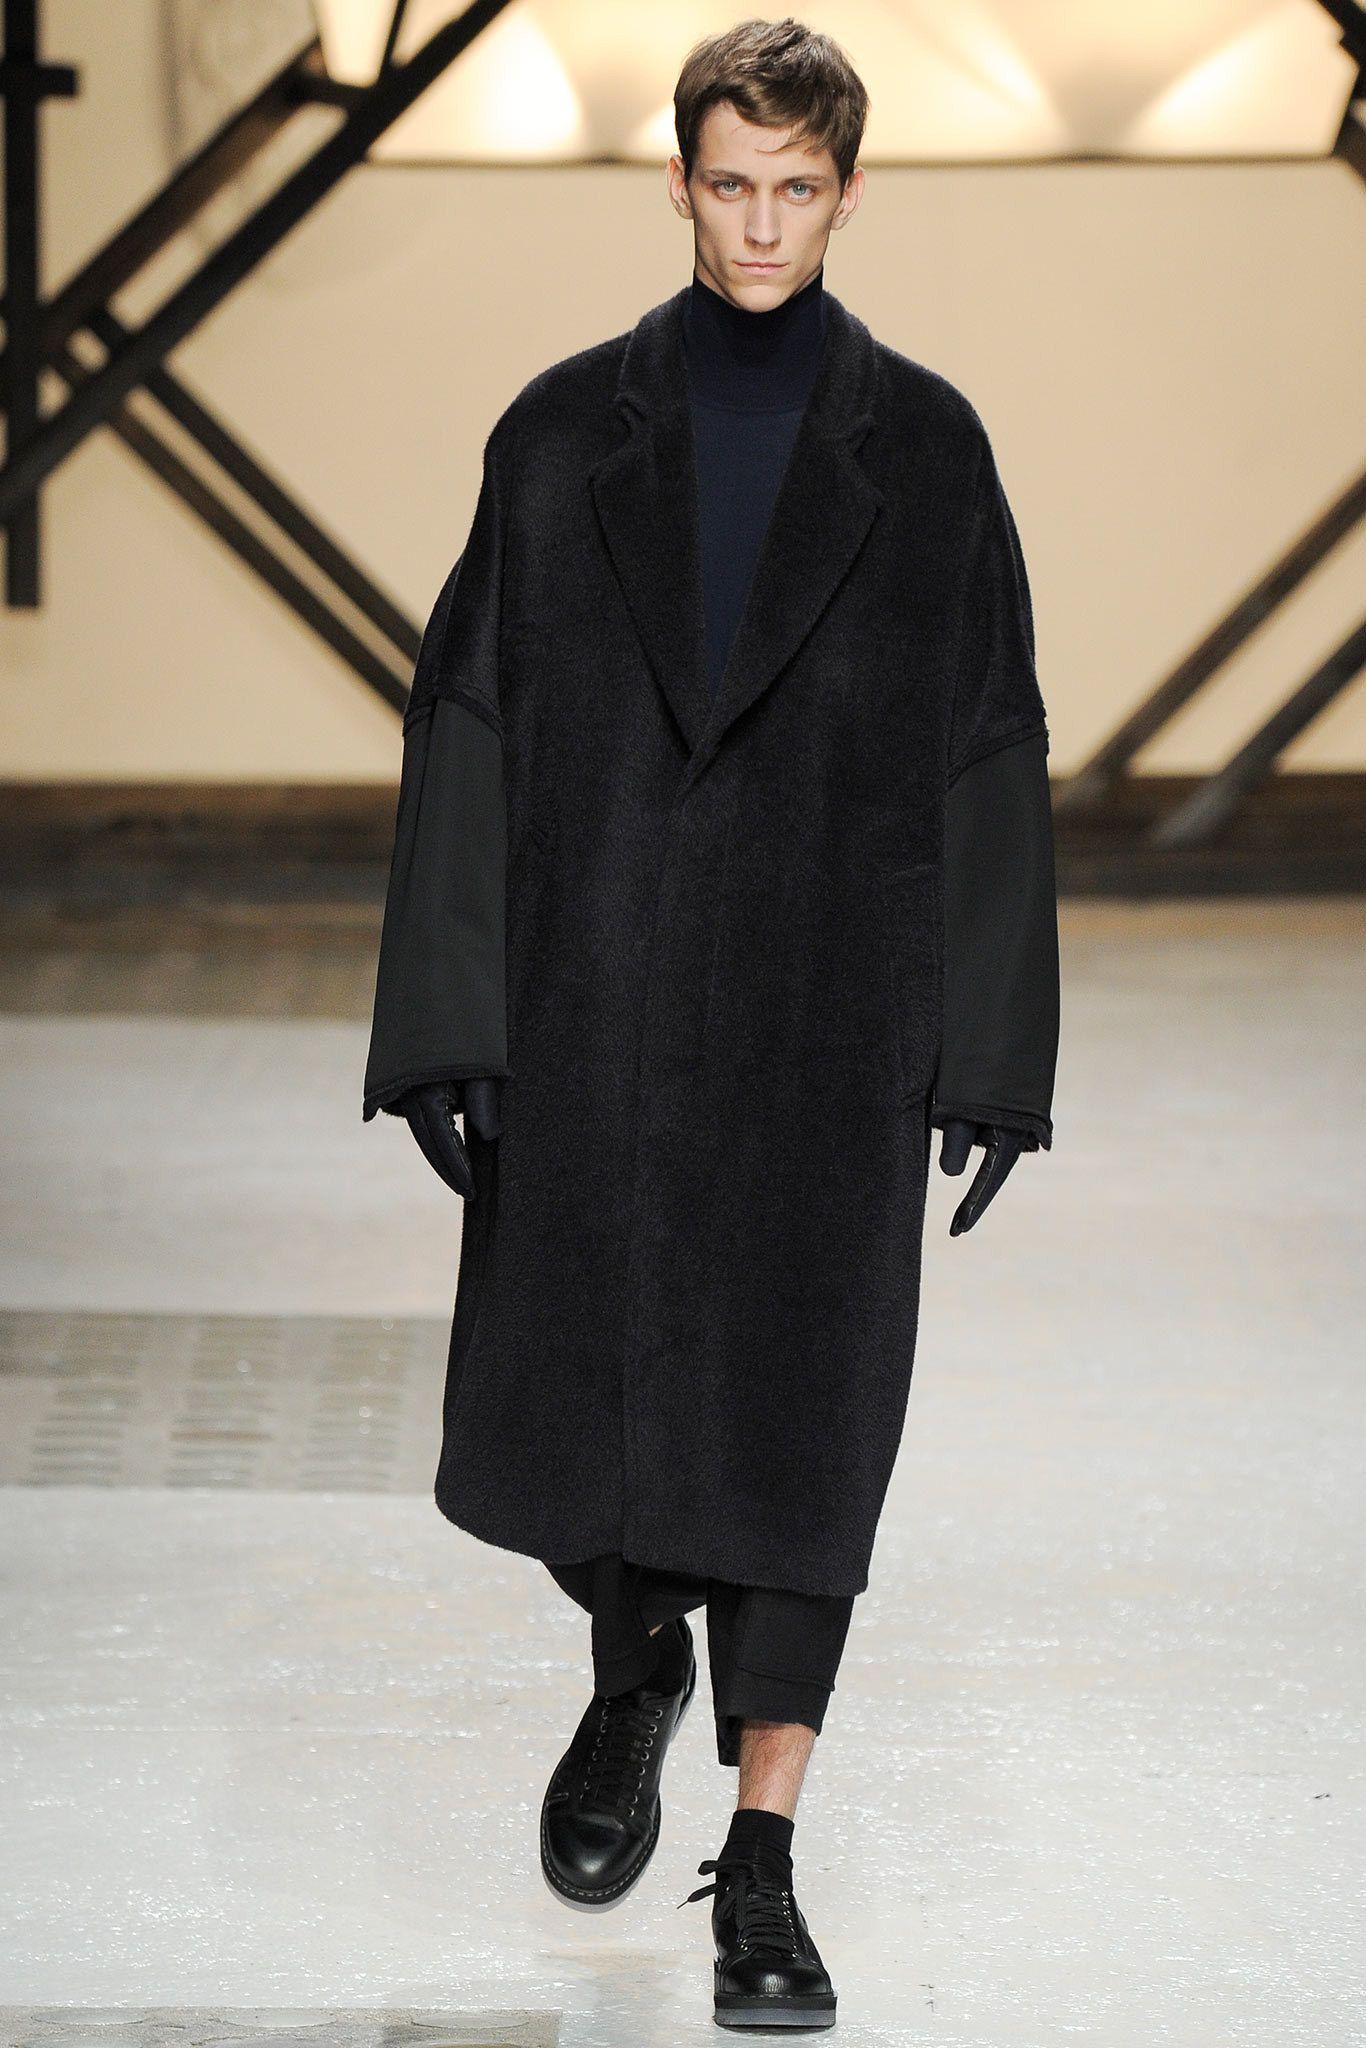 Damir Doma Fall 2014 Menswear Fashion Show